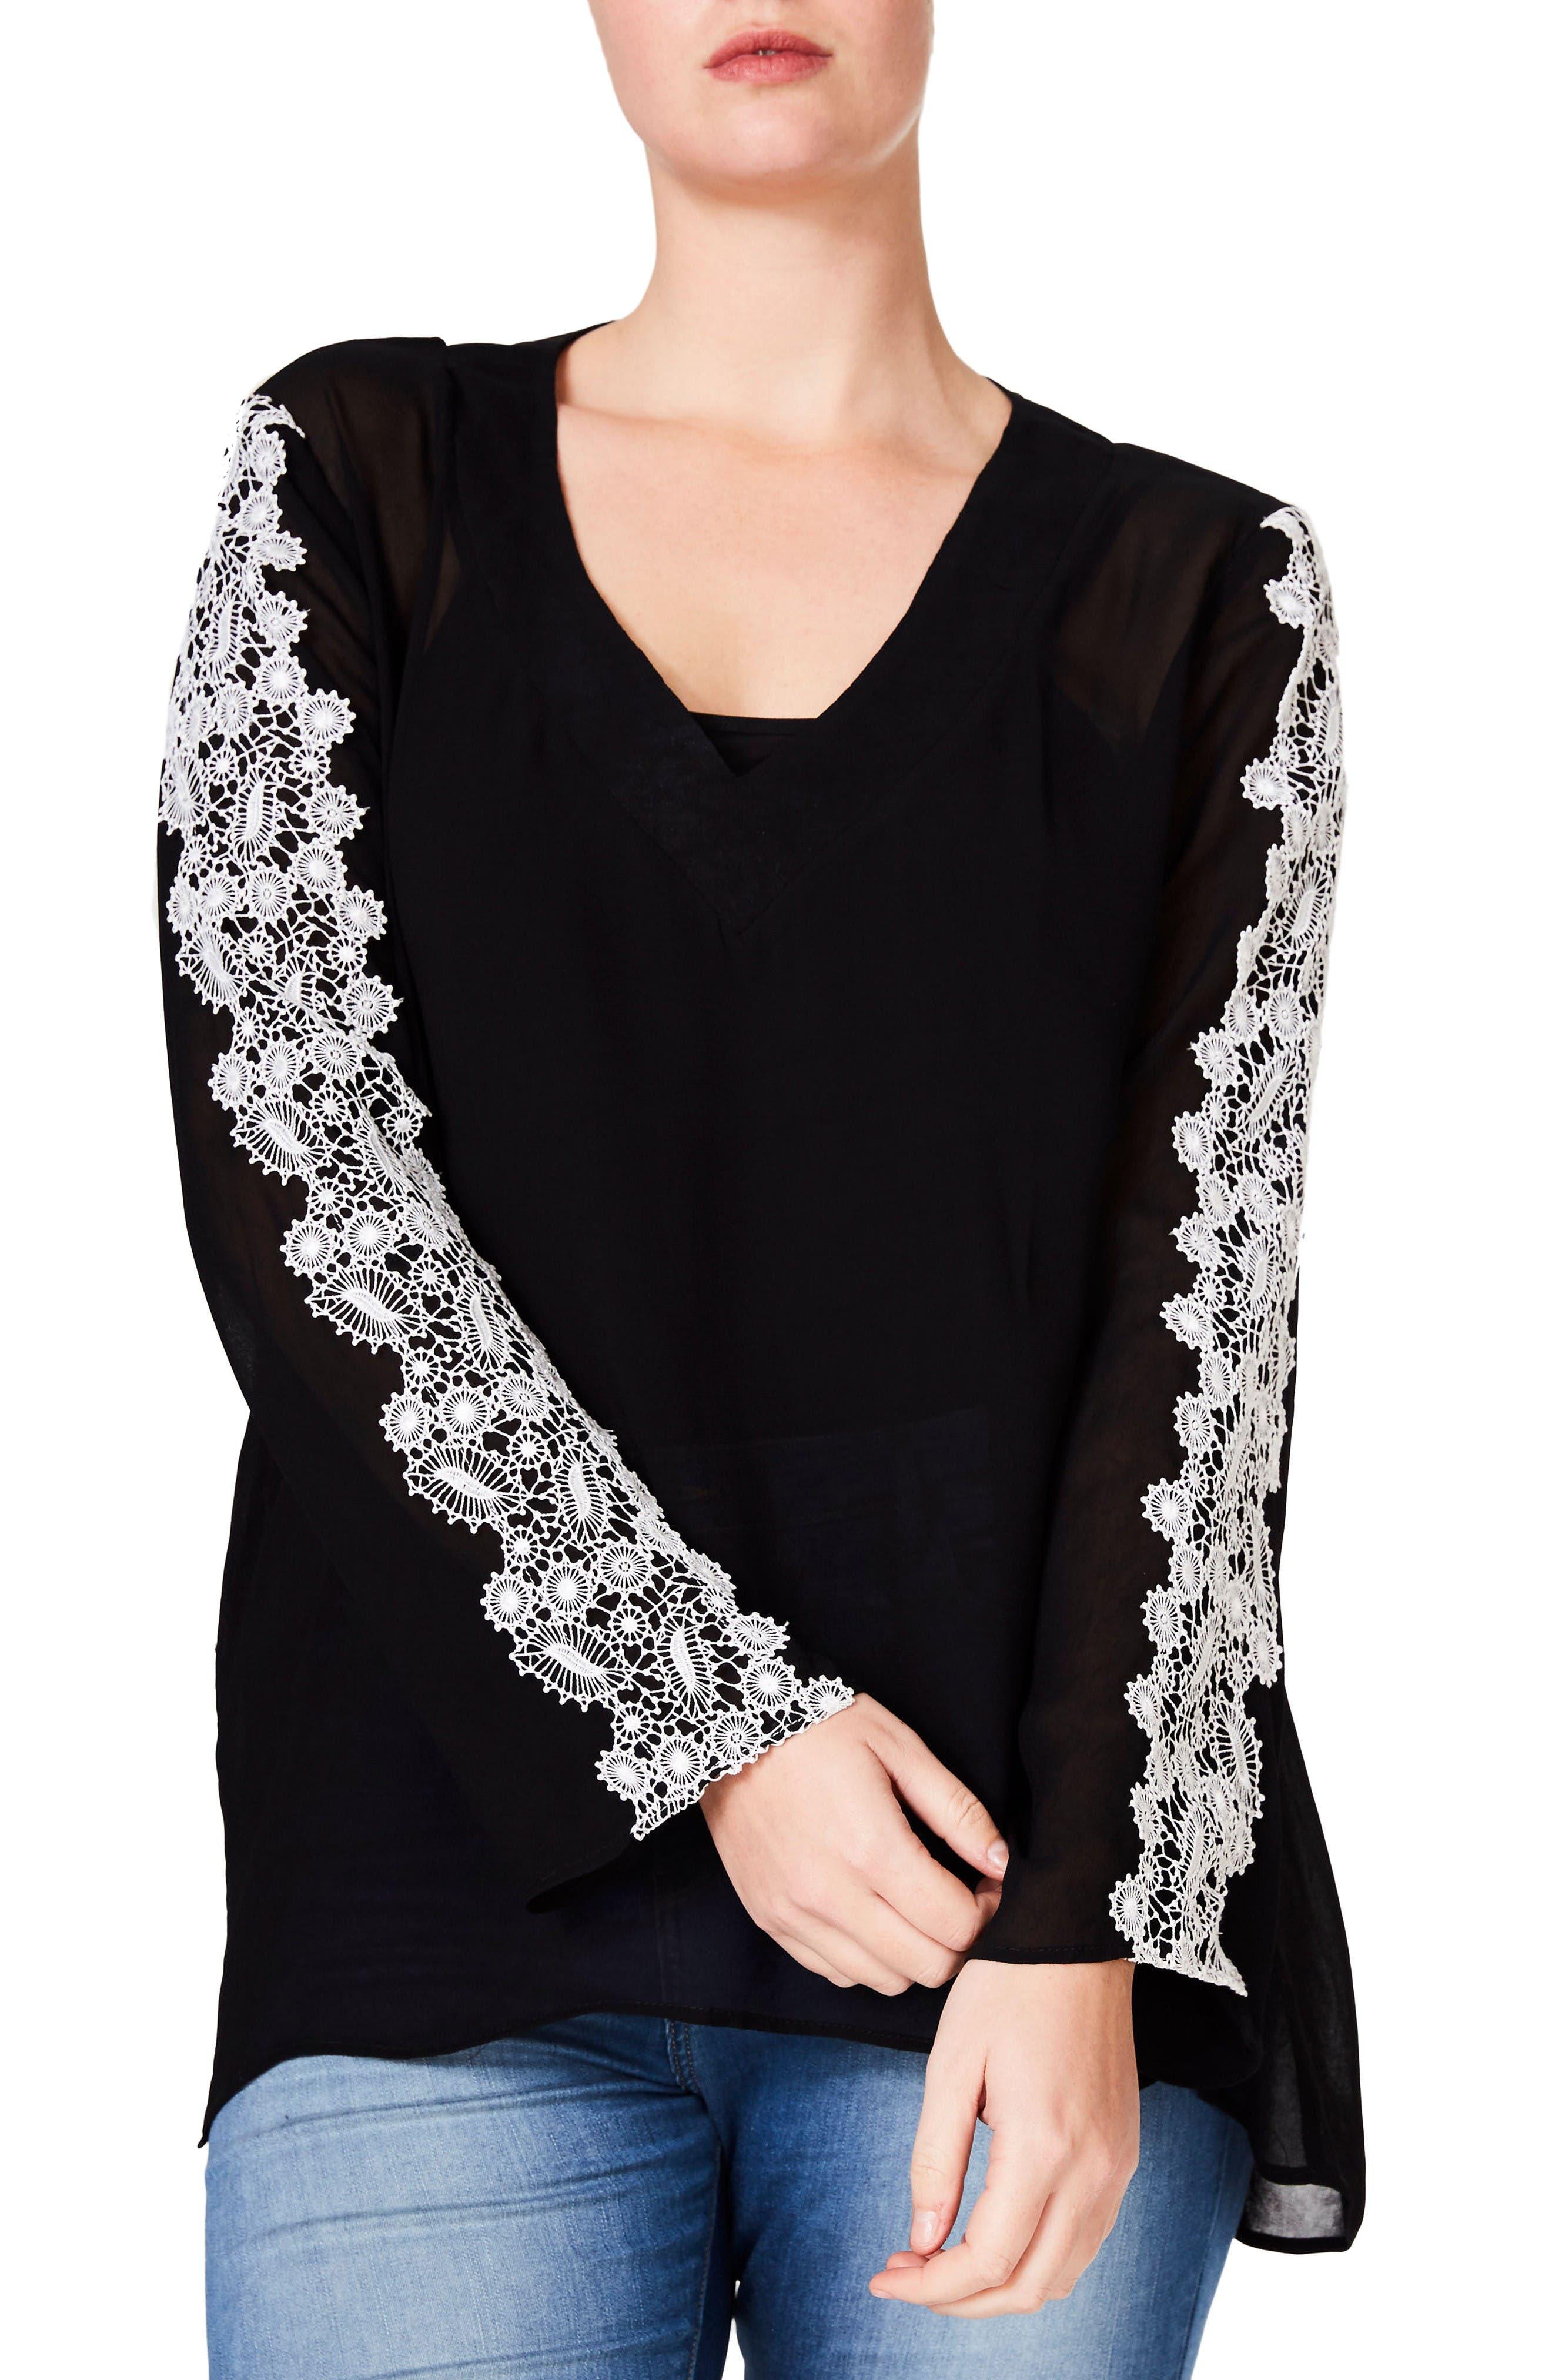 Main Image - ELVI Embroidered Sleeve Blouse (Plus Size)